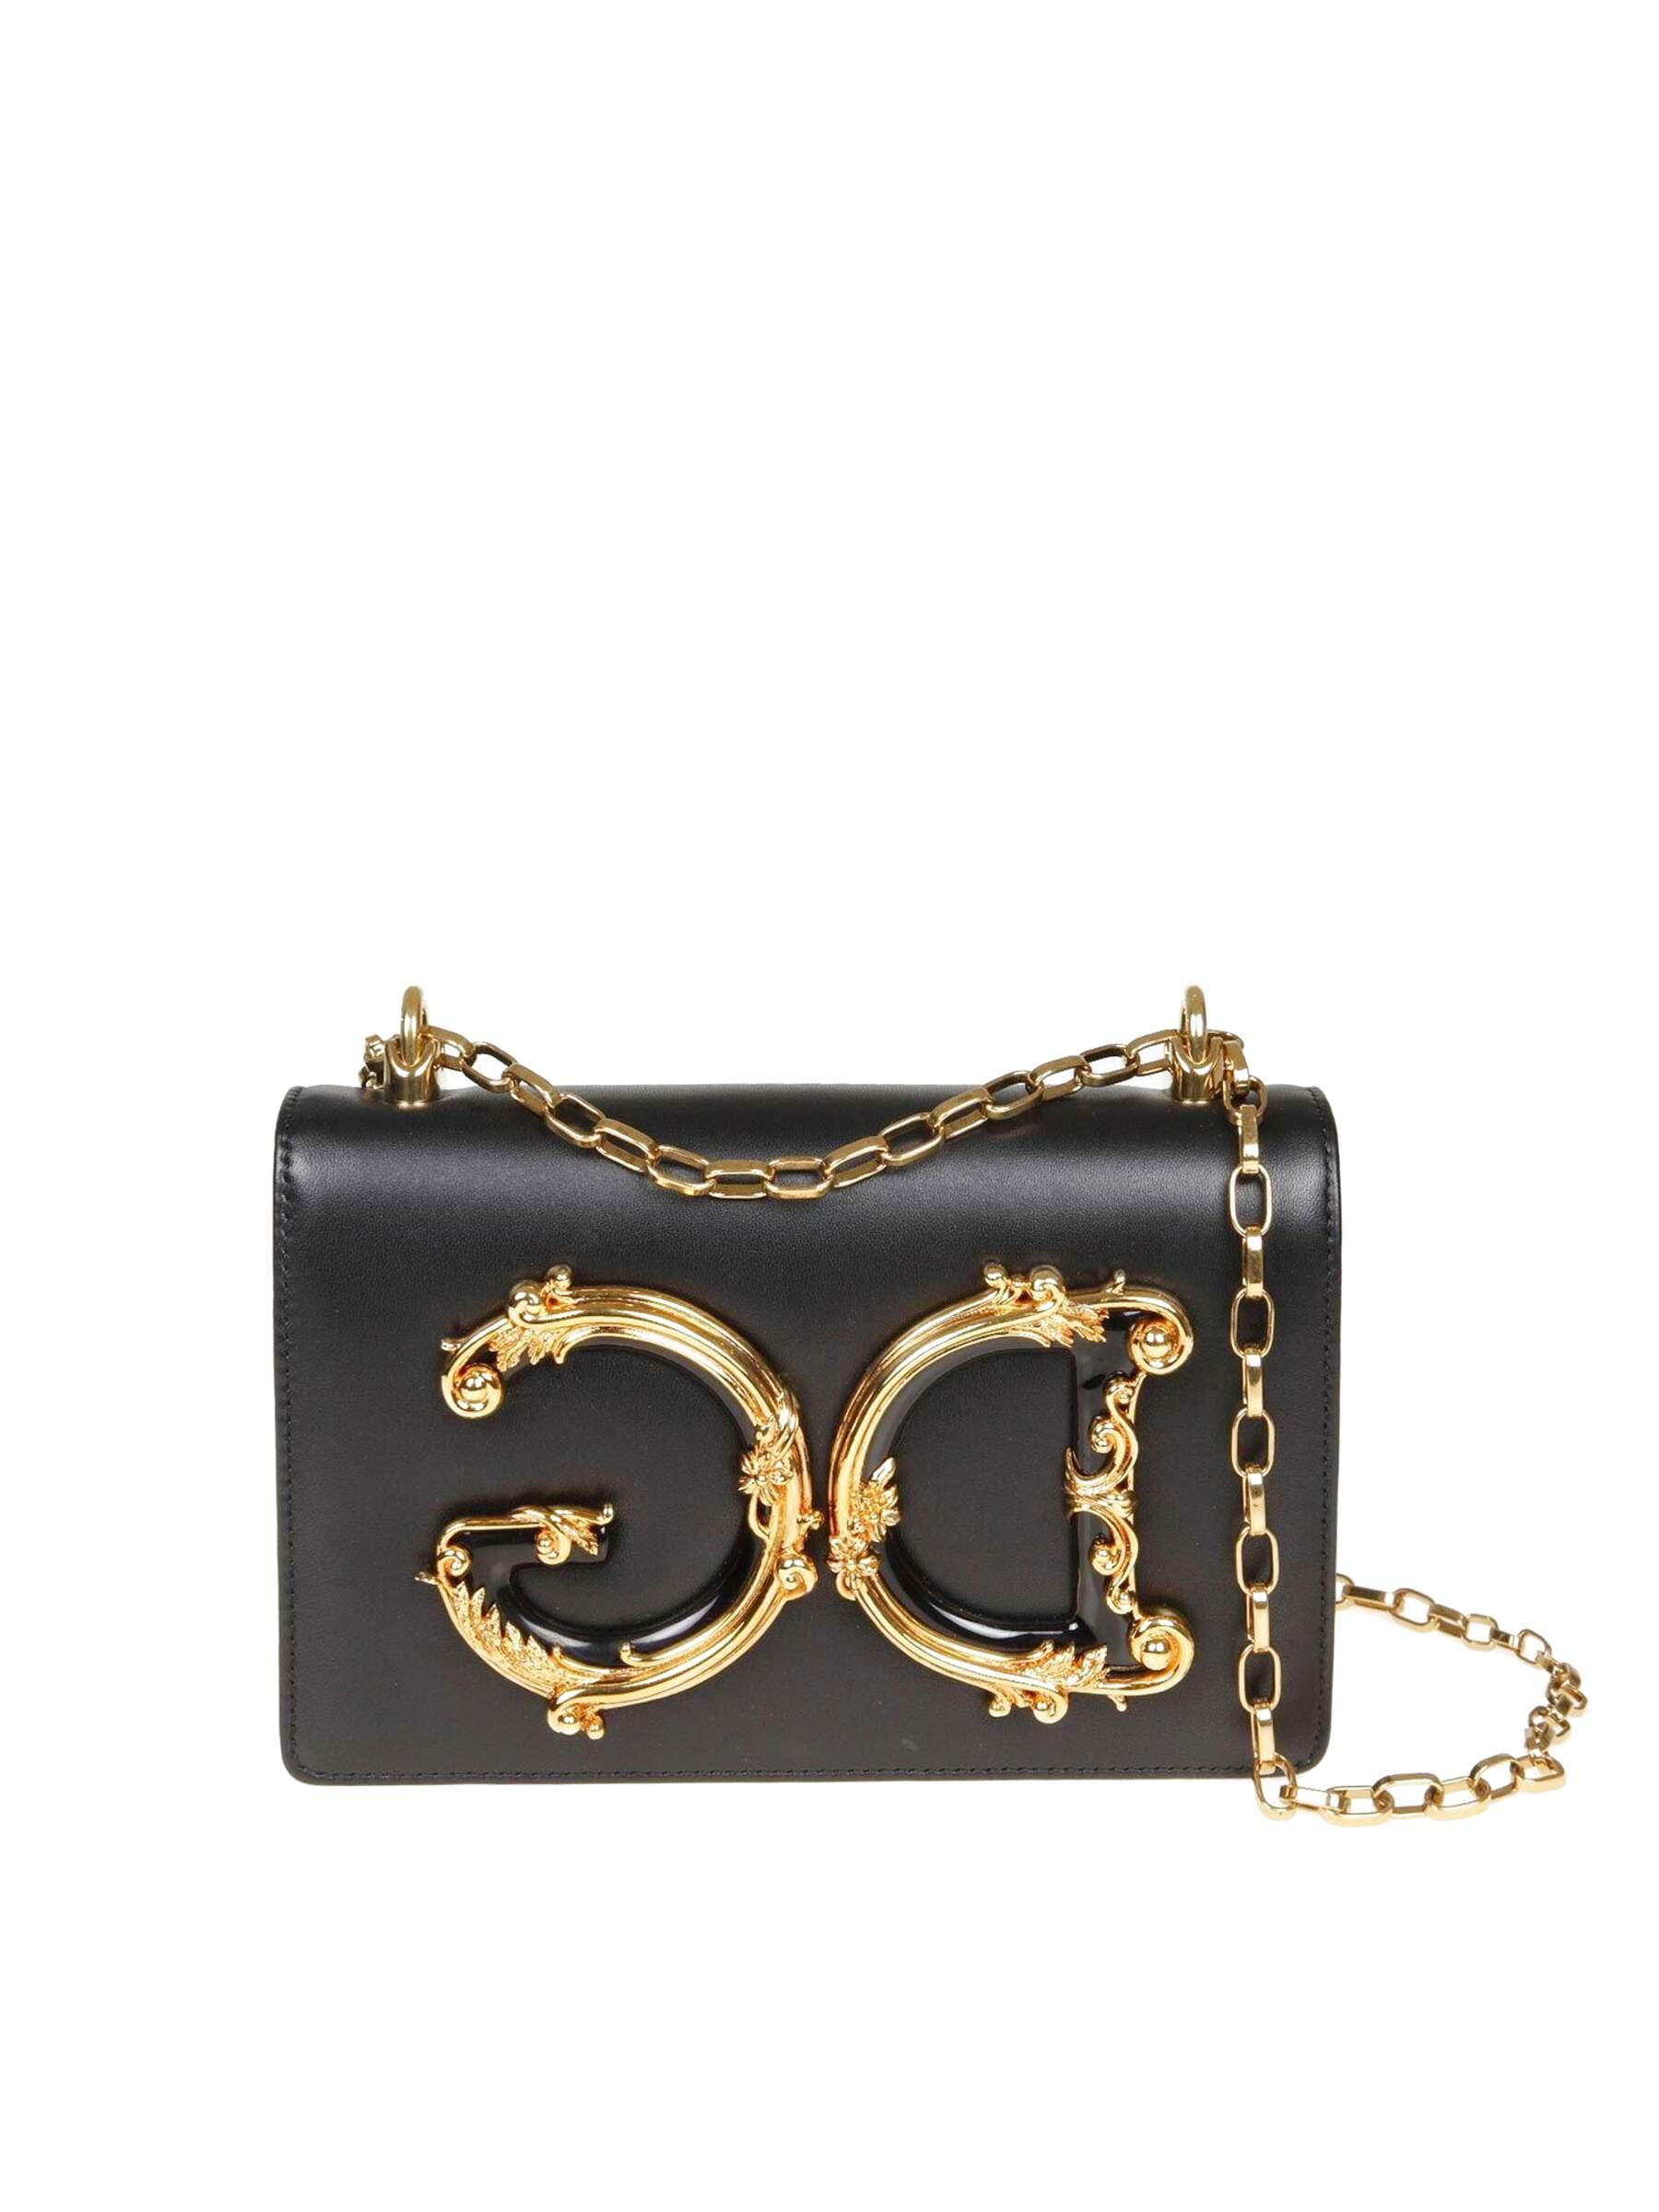 d g handbags for sale